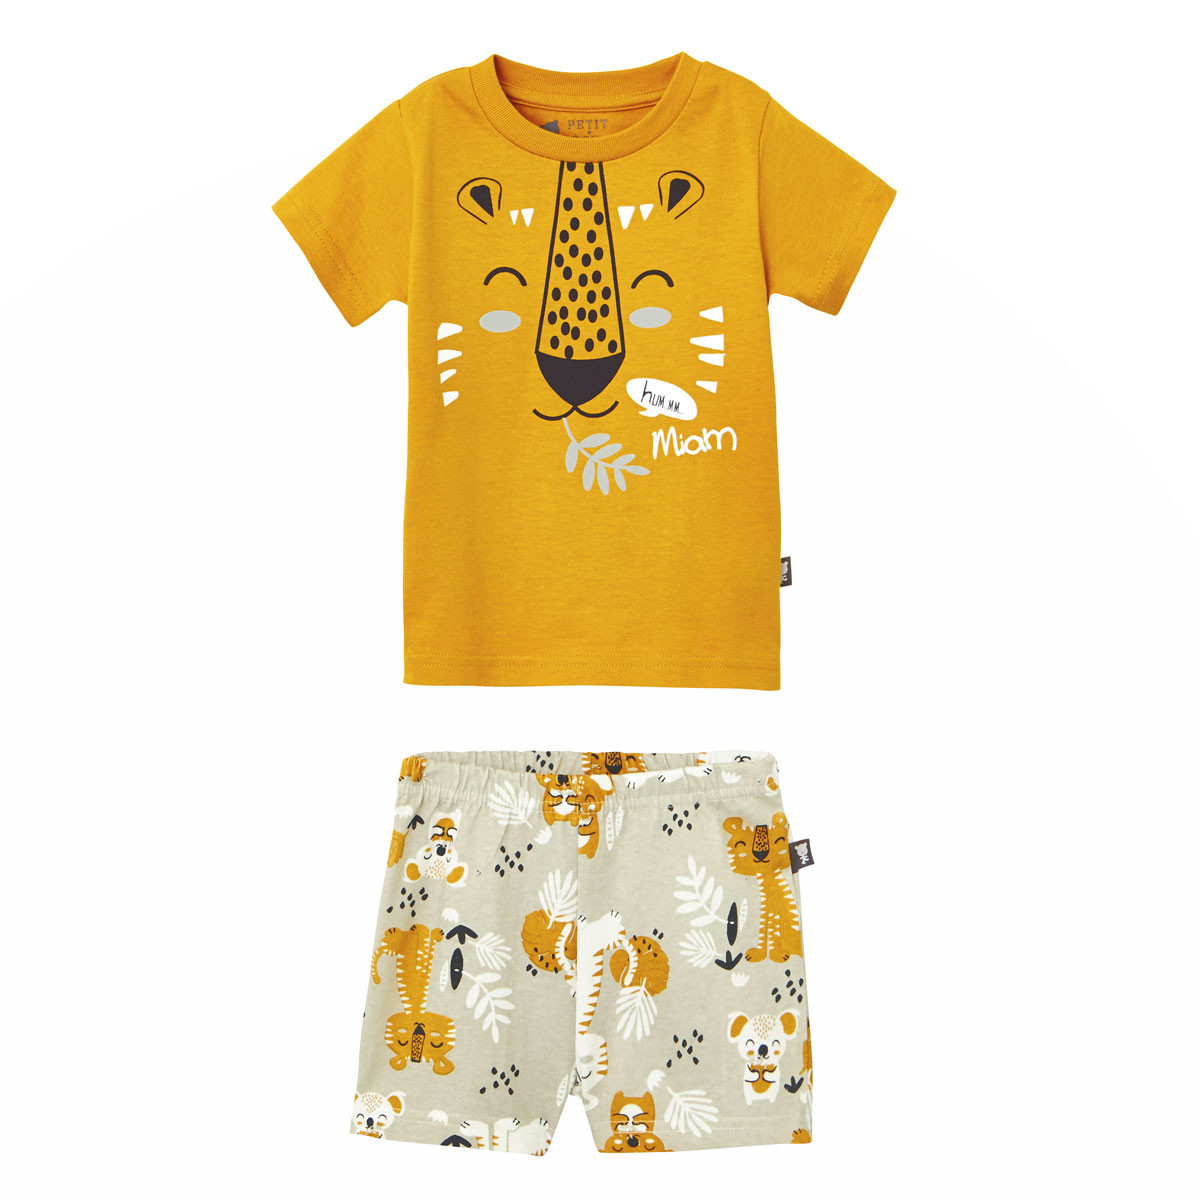 e16a21572e47b Pyjama manches courtes garçon Tigala - PETIT BEGUIN